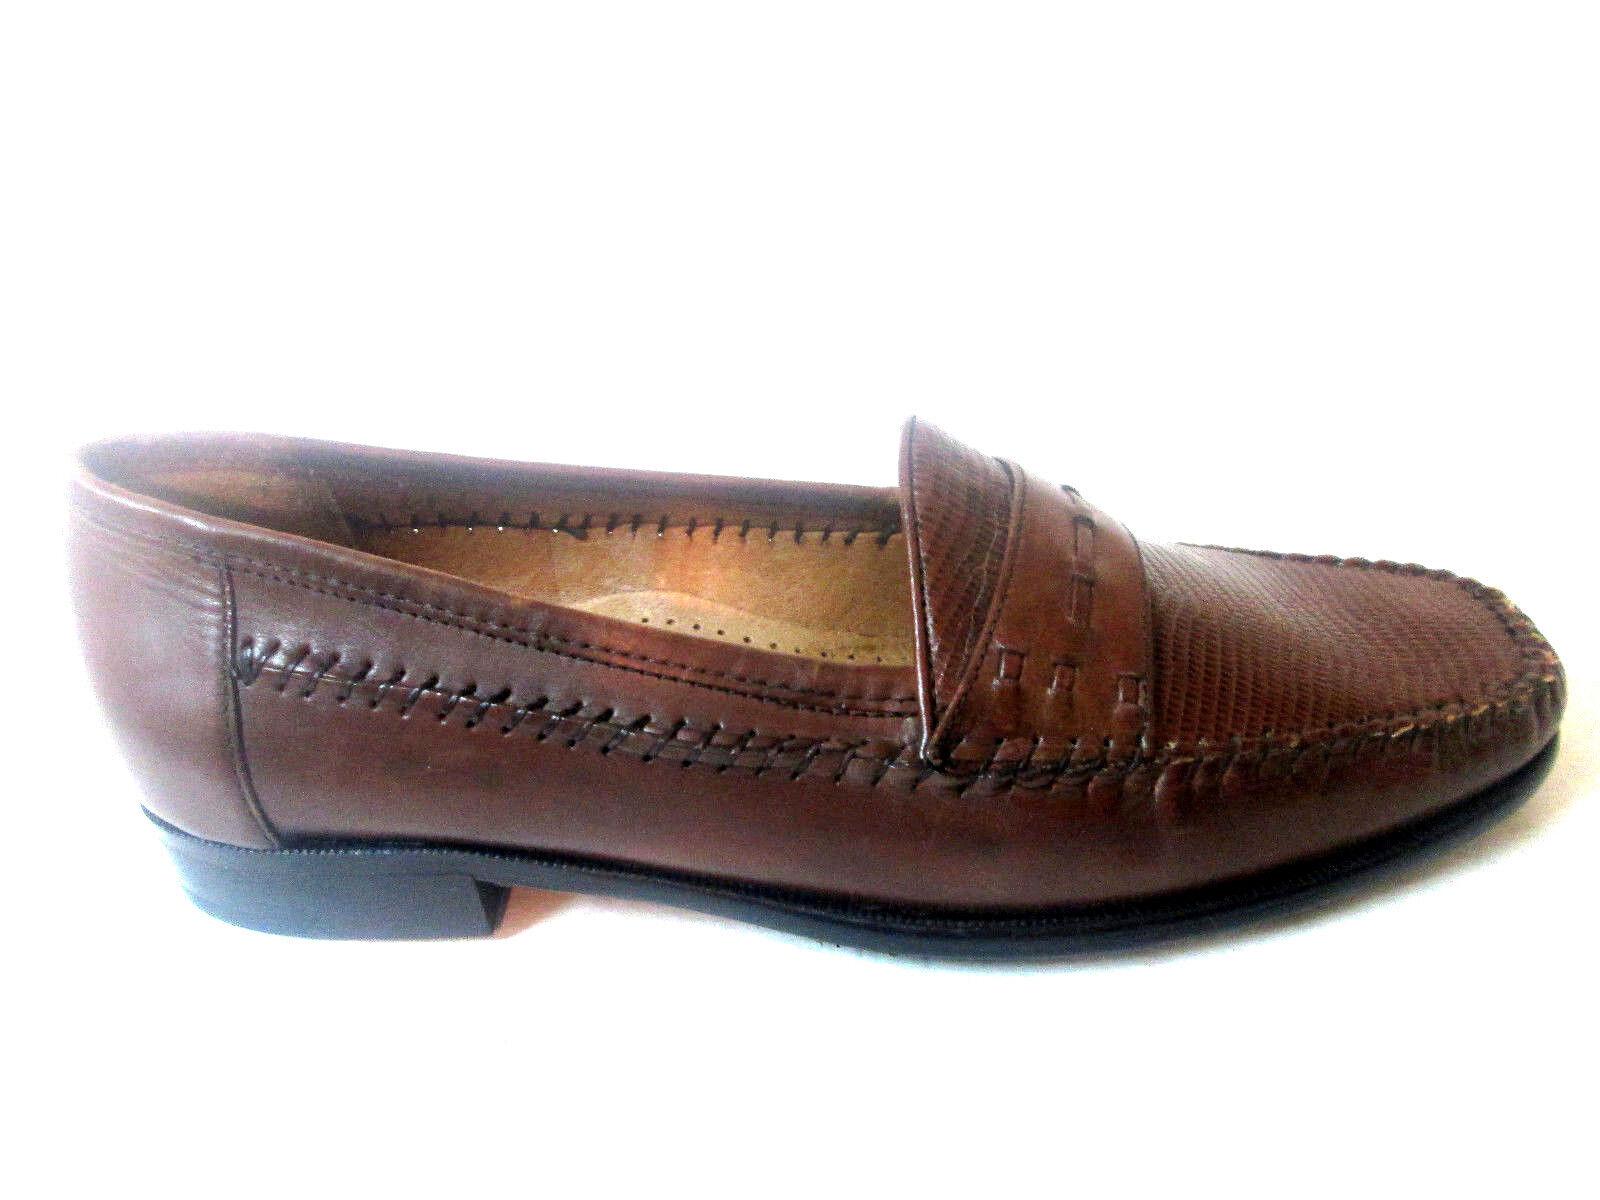 Giorgio Brutini Le Glove Tan Loafer Men schuhe Leather A-Line Lizard Print 478014